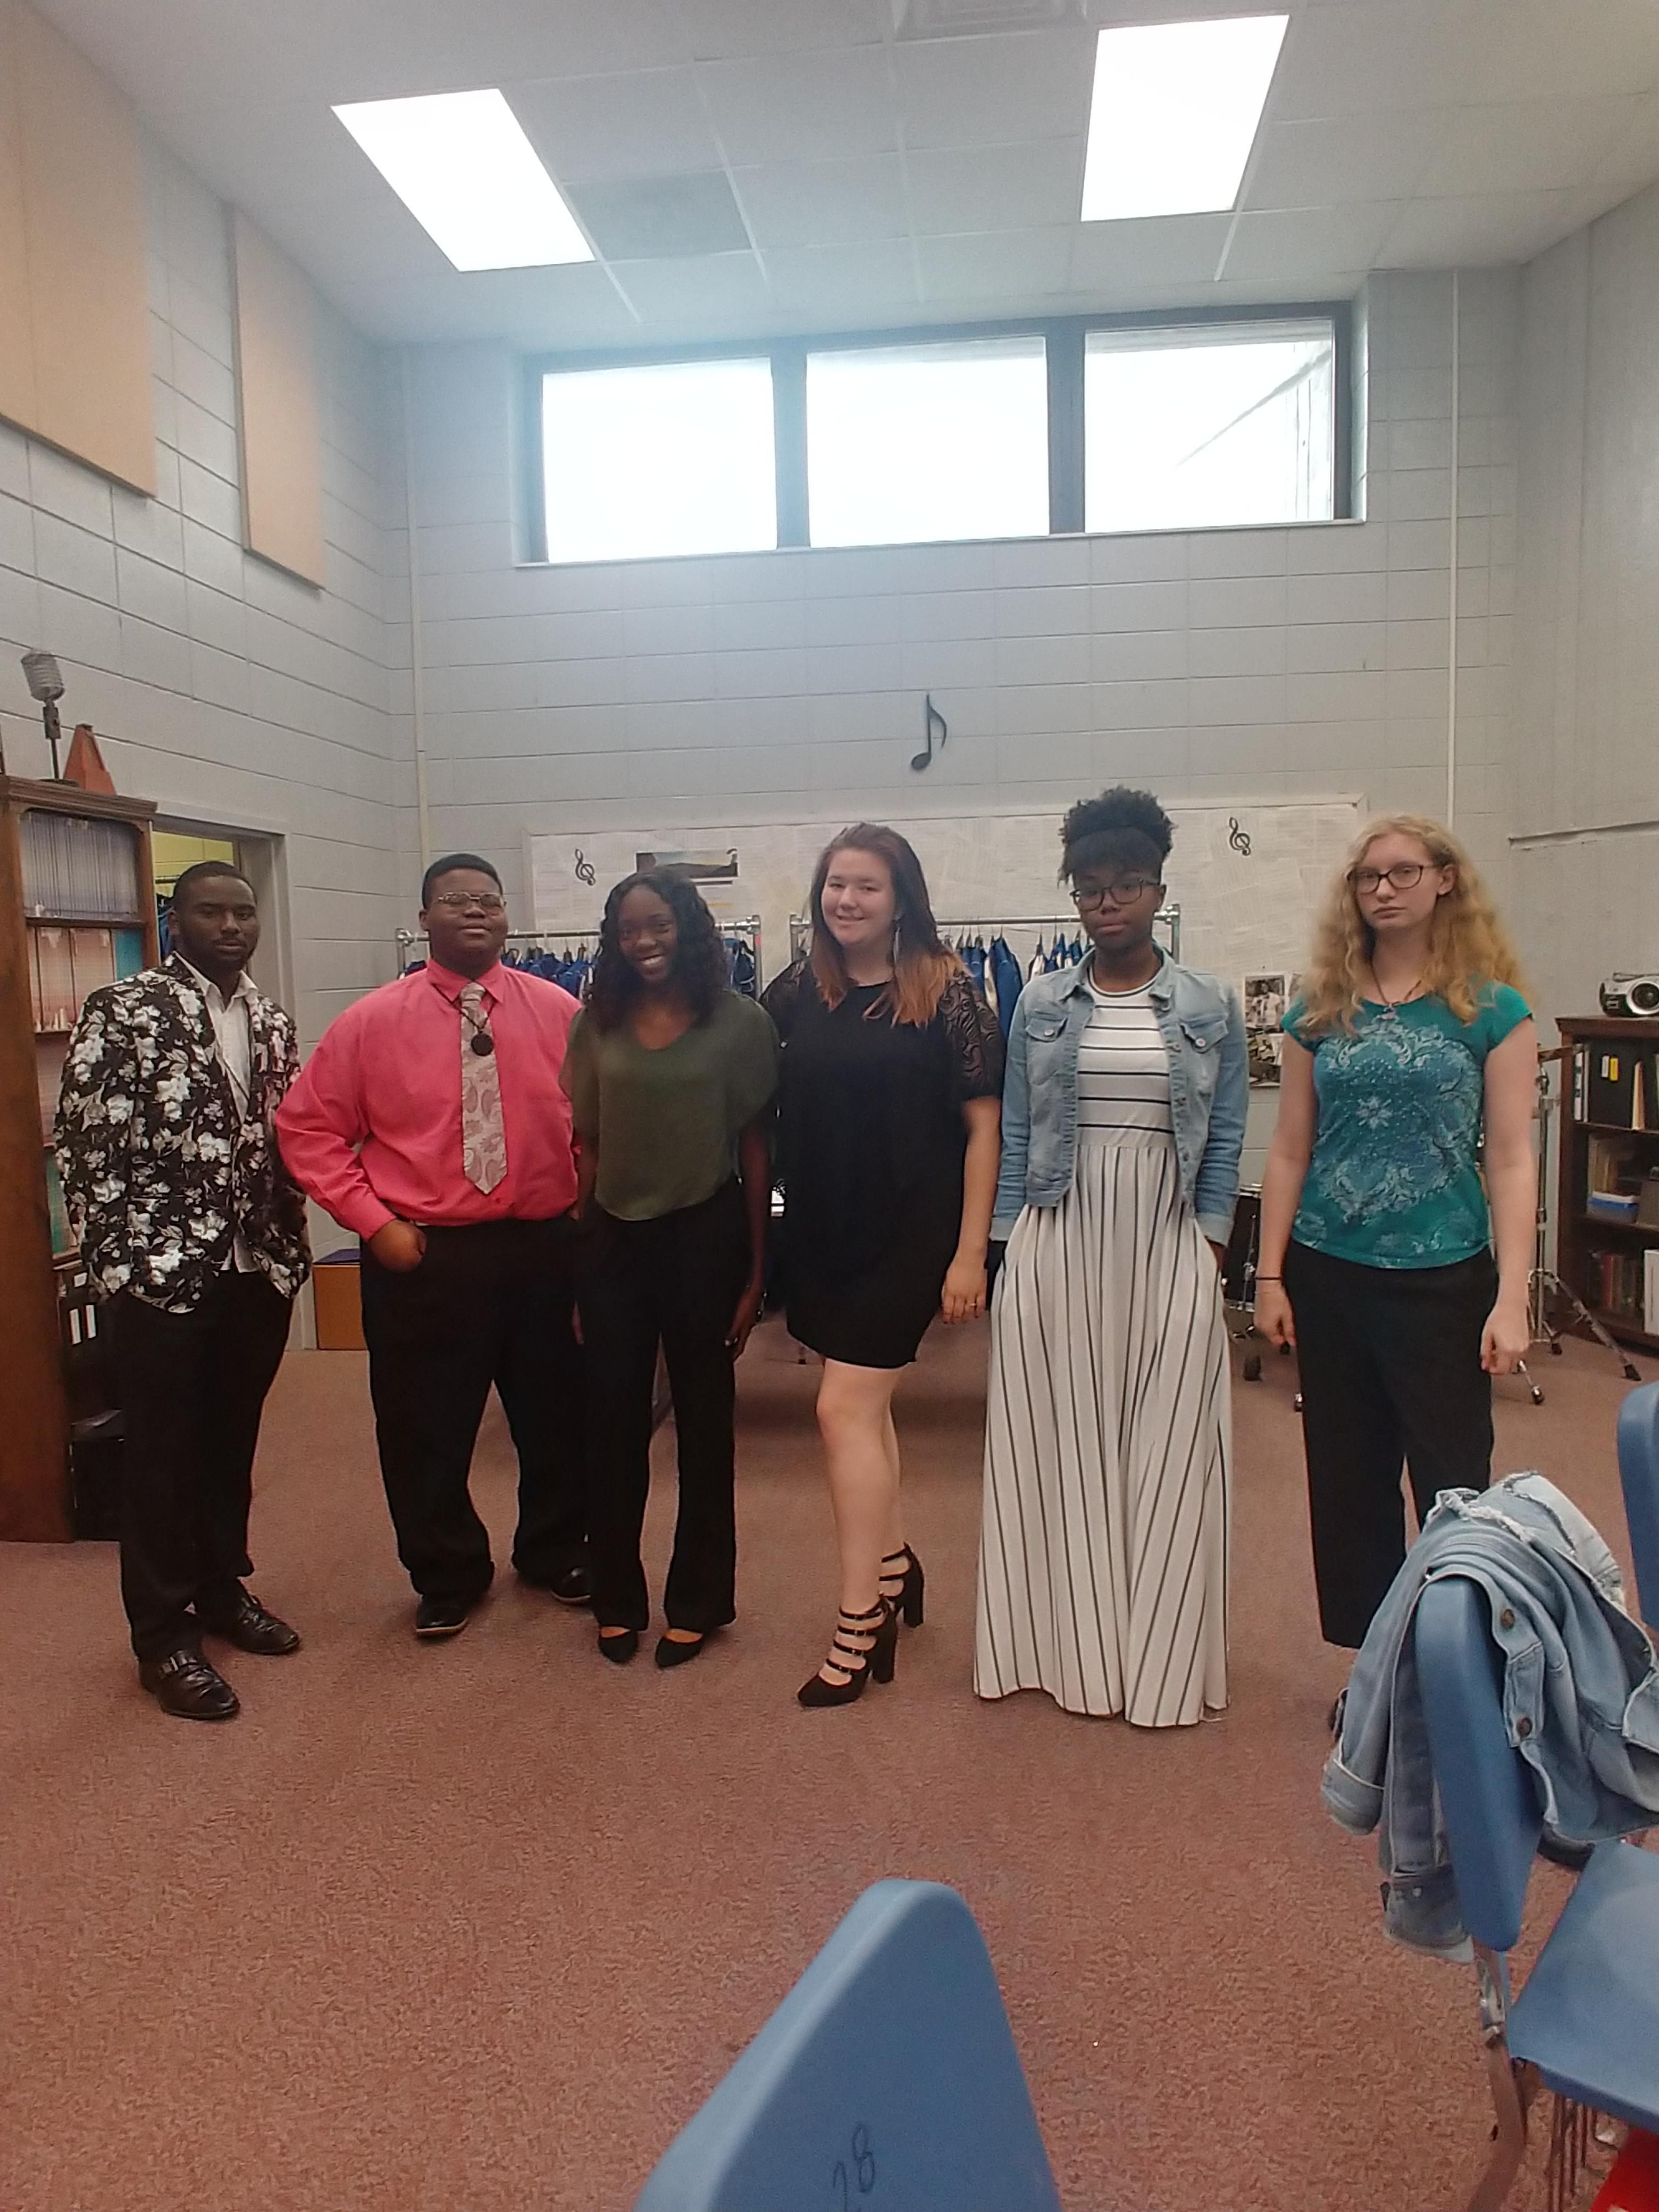 BCHS Fine Arts Dept. 2019-2020 School Year - Dress for Success Wednesdays